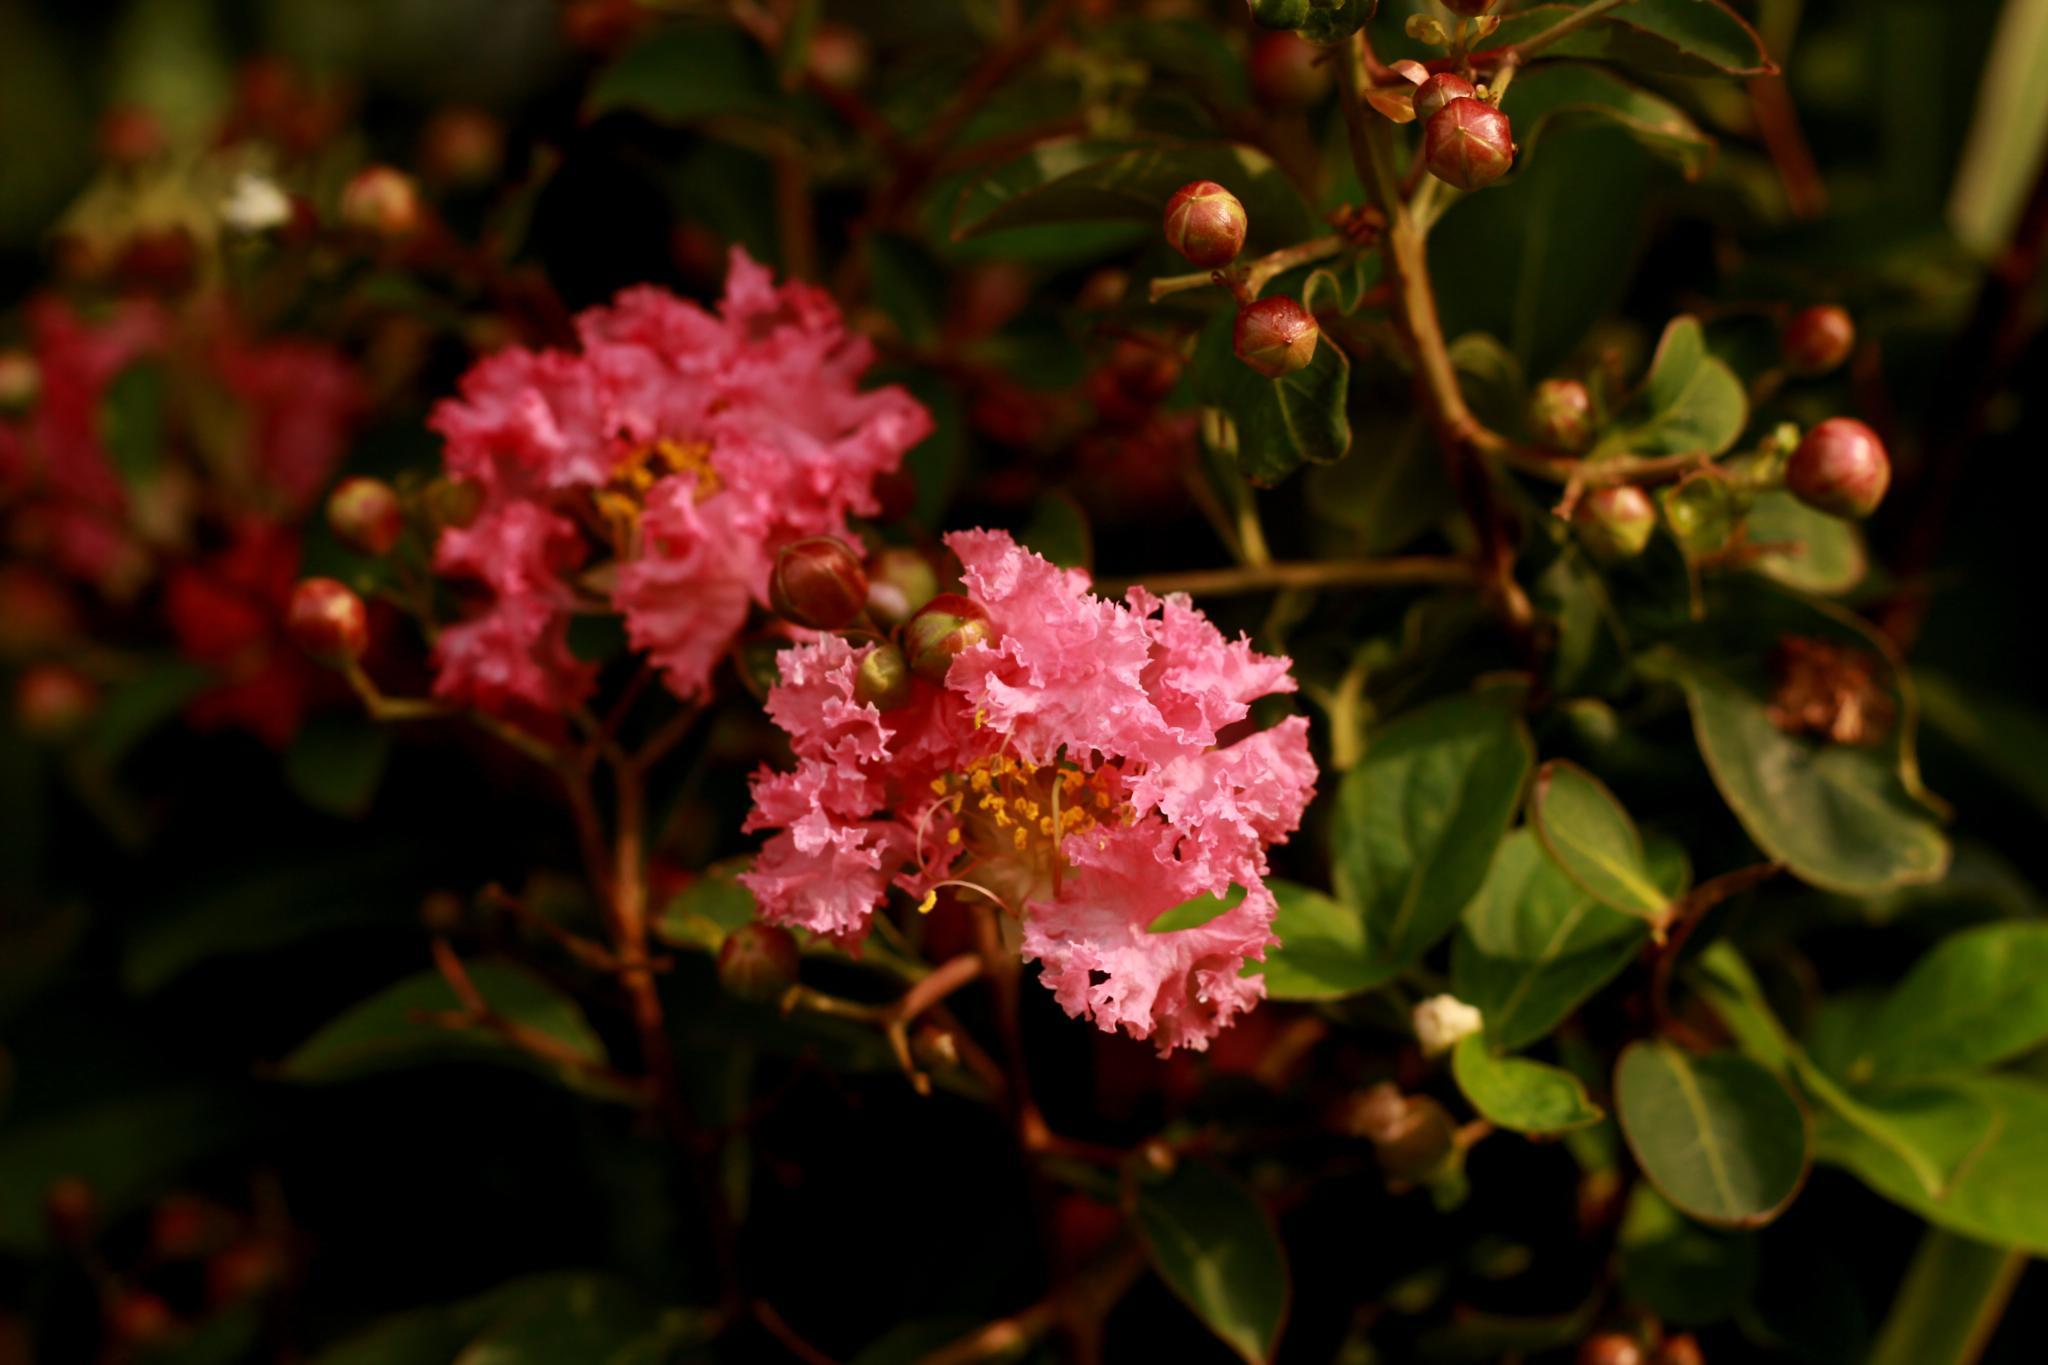 Flower by Isa Shukran